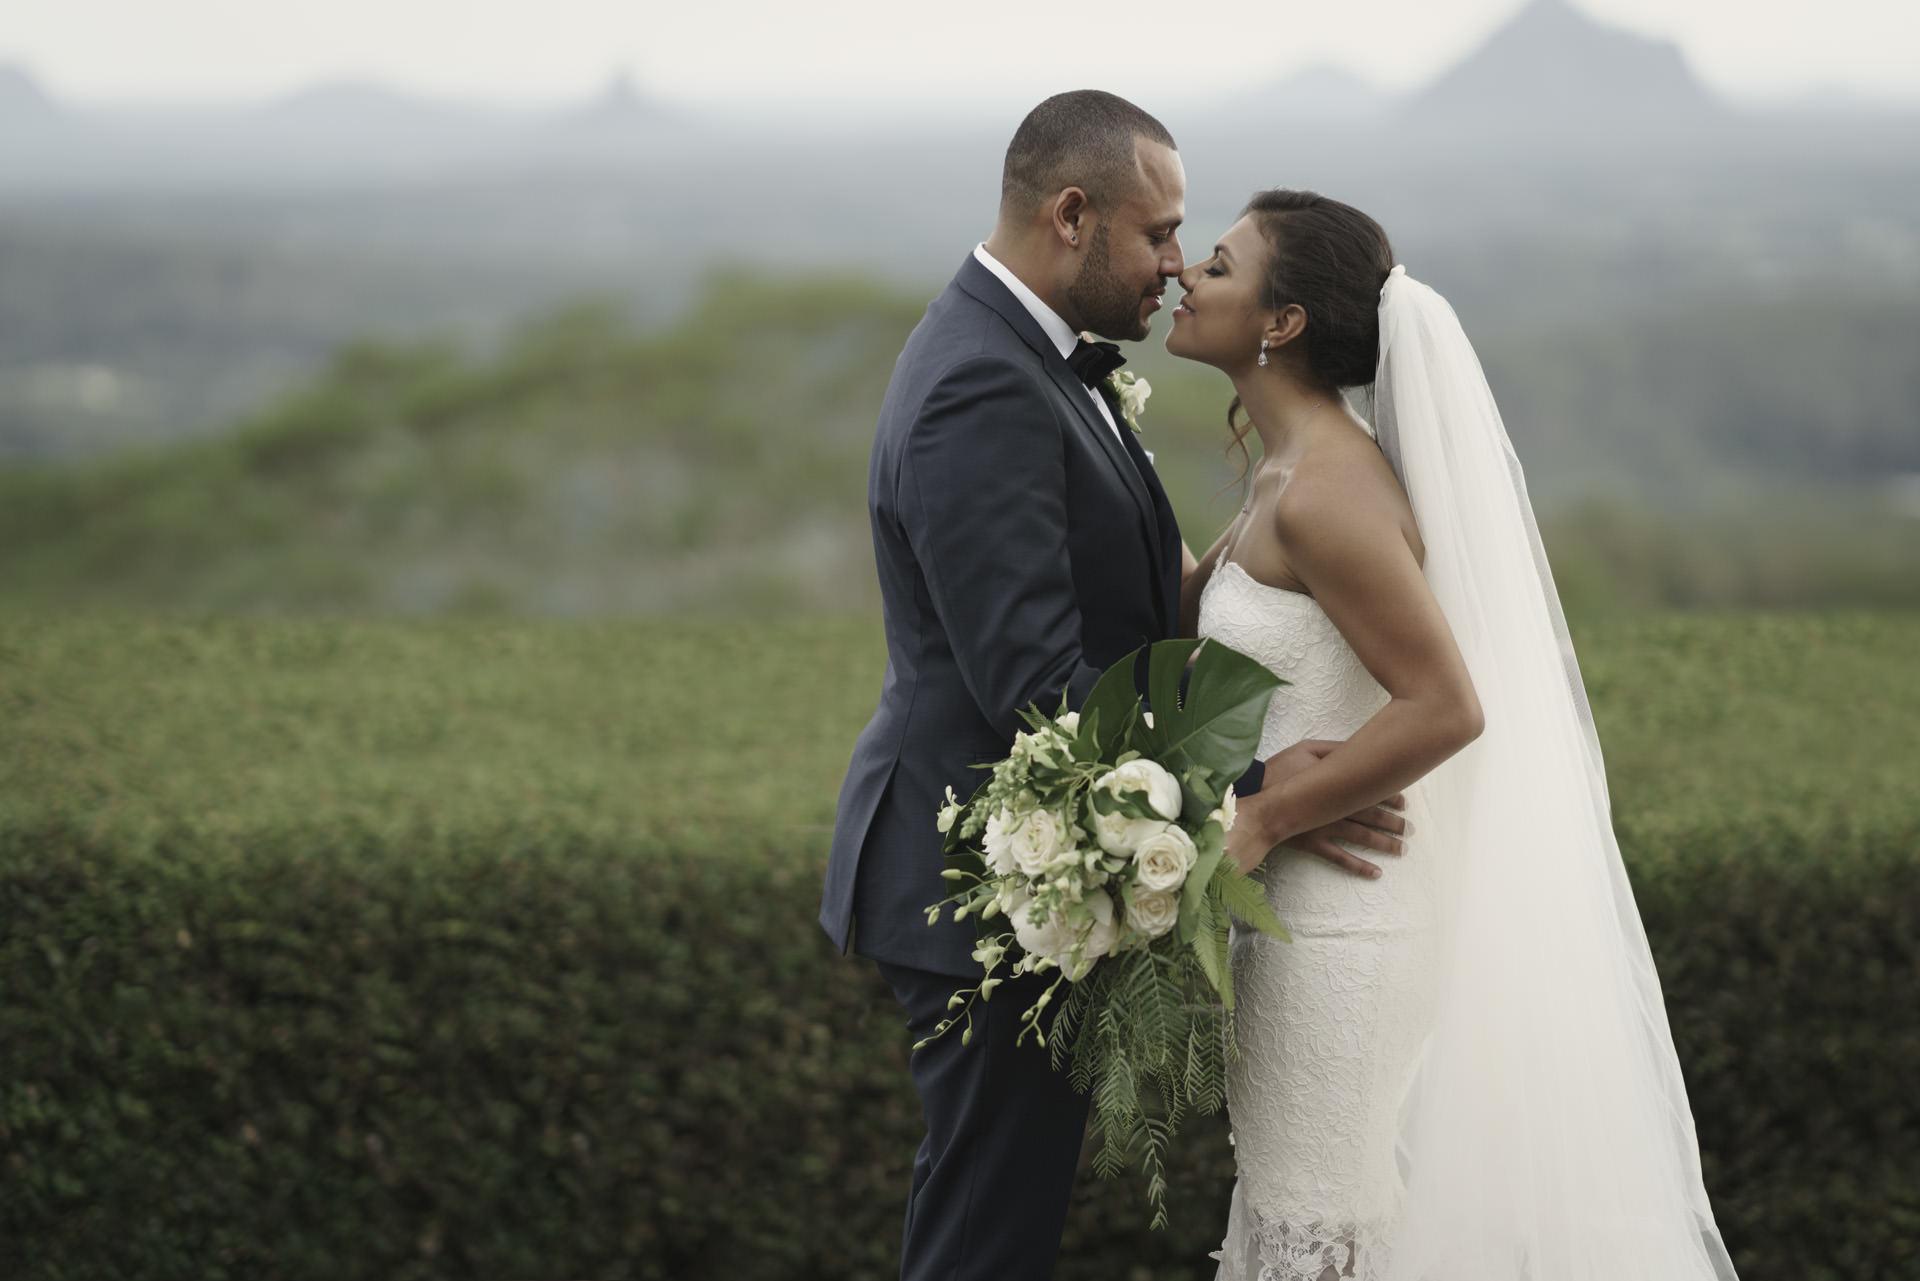 Weddings at Tiffany's Wedding Video